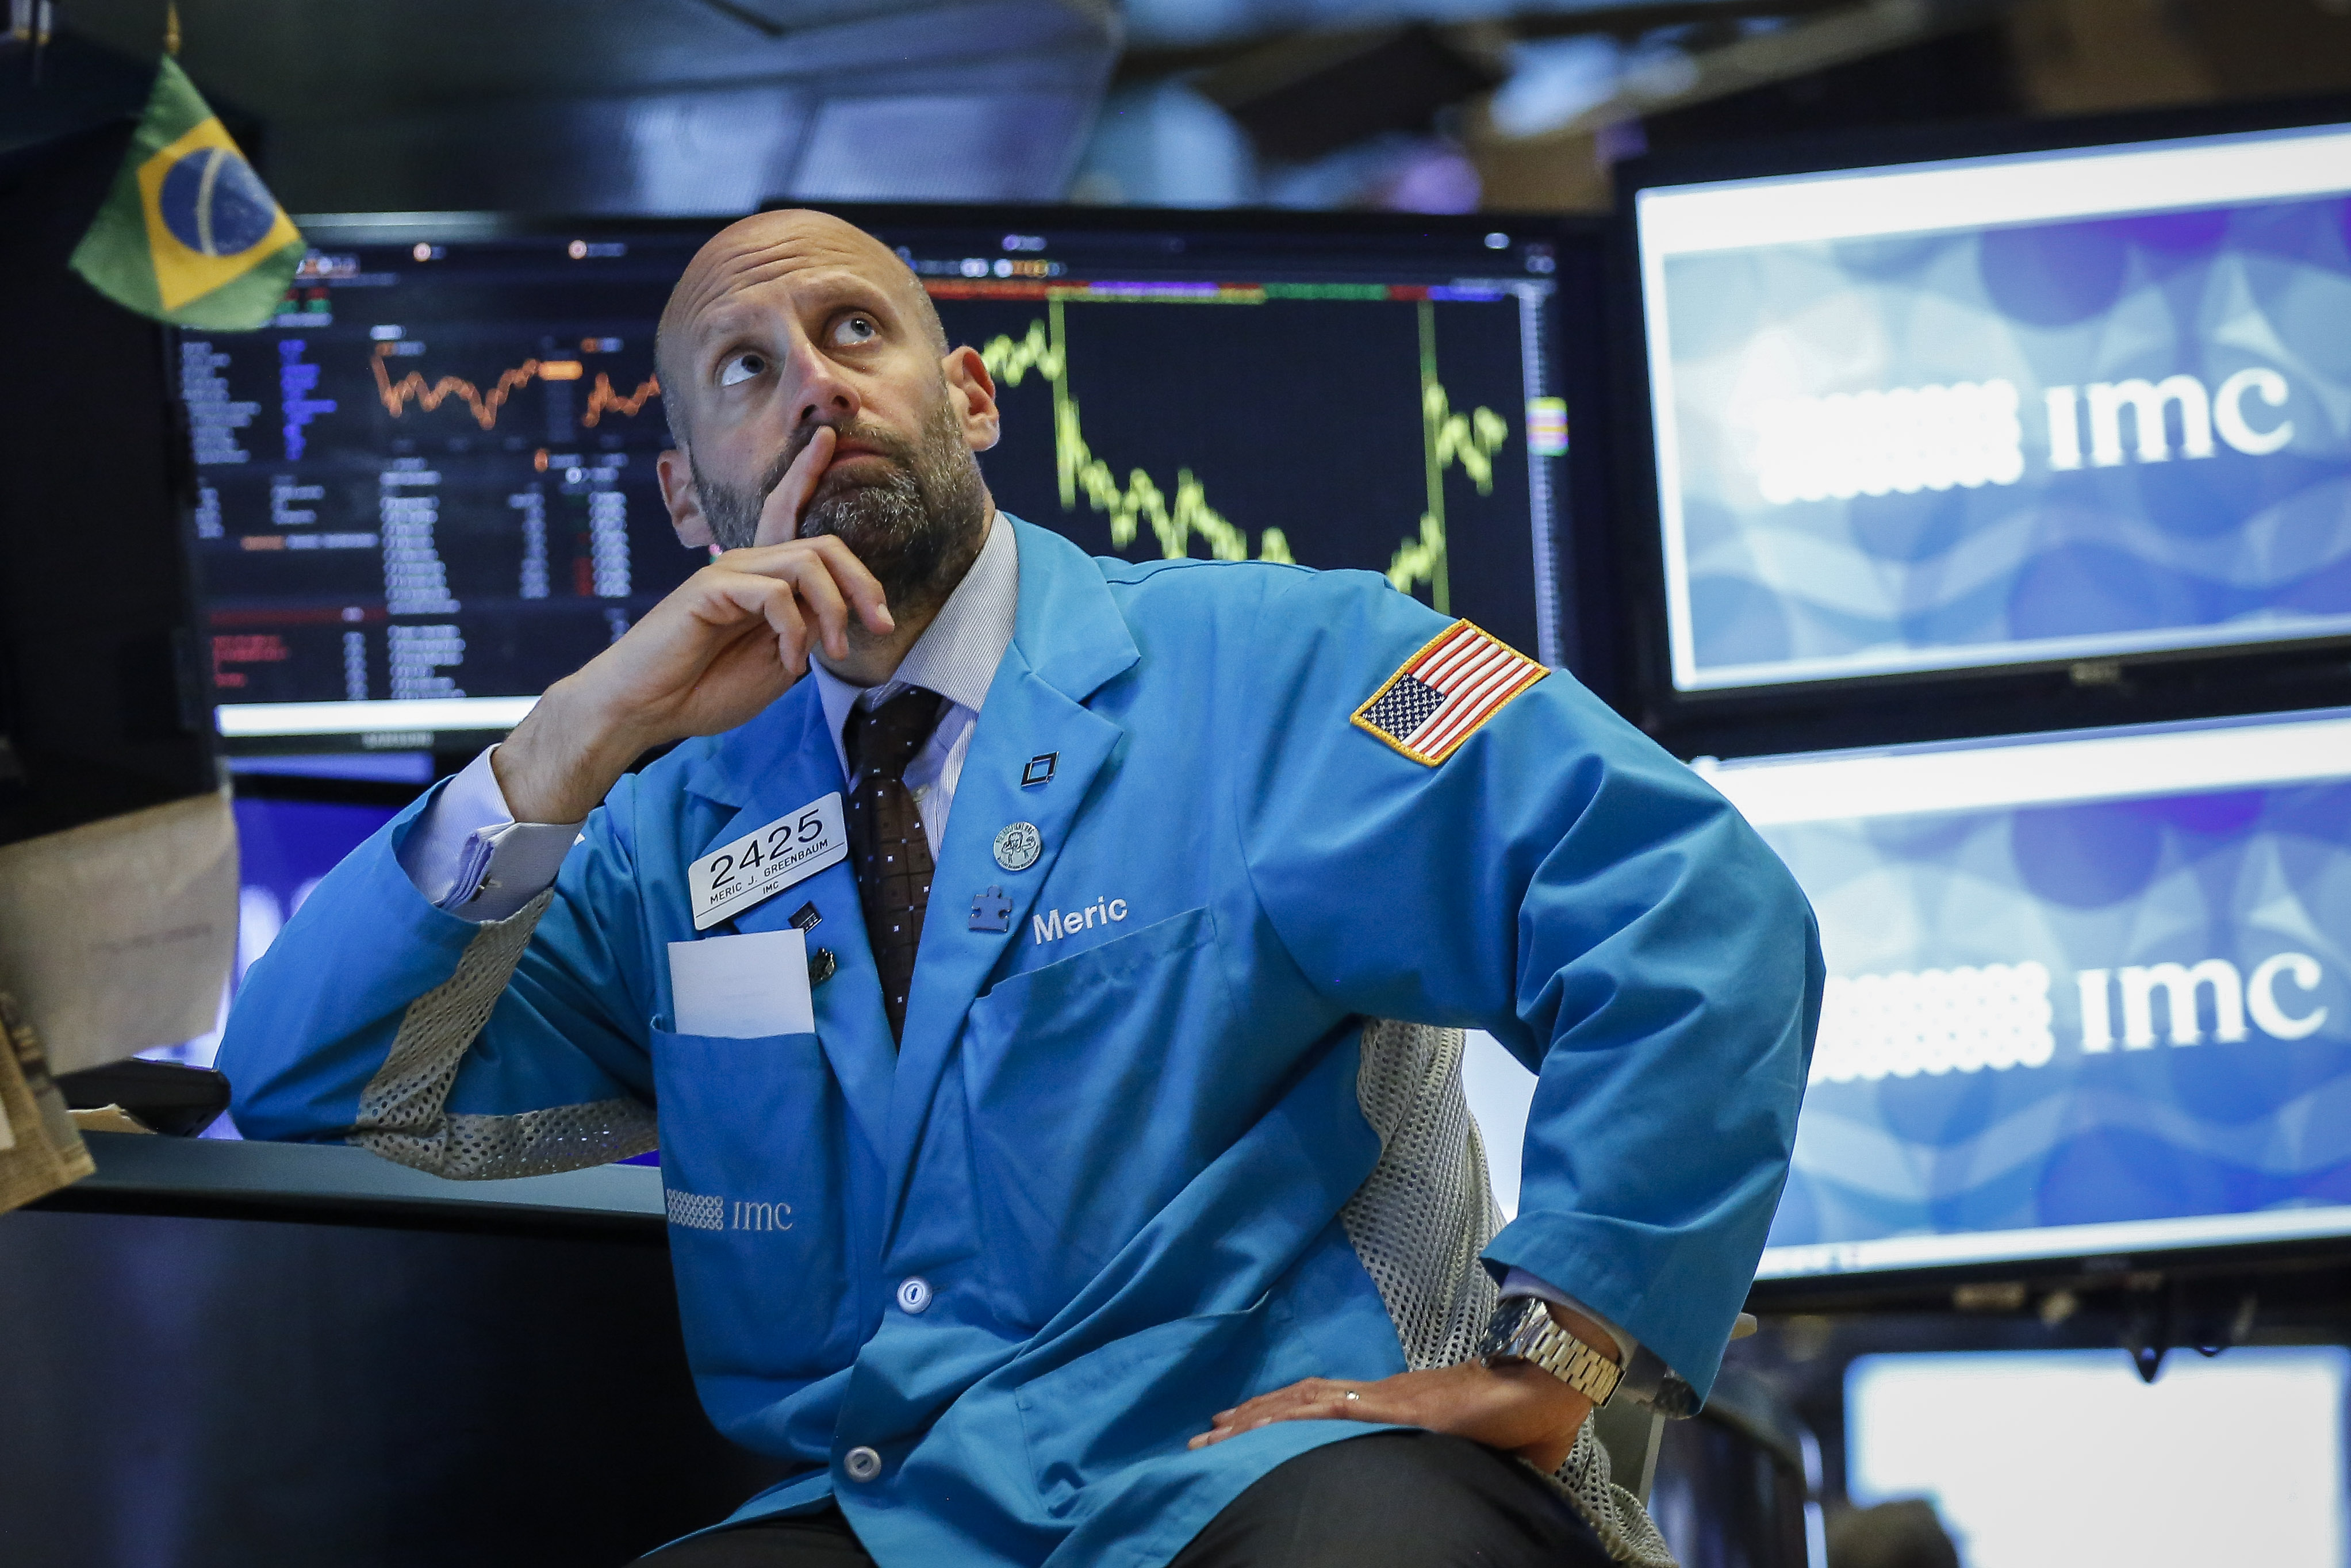 Stocks In Free-fall: Dow Plummets 900 Points As Coronavirus Tightens Grip